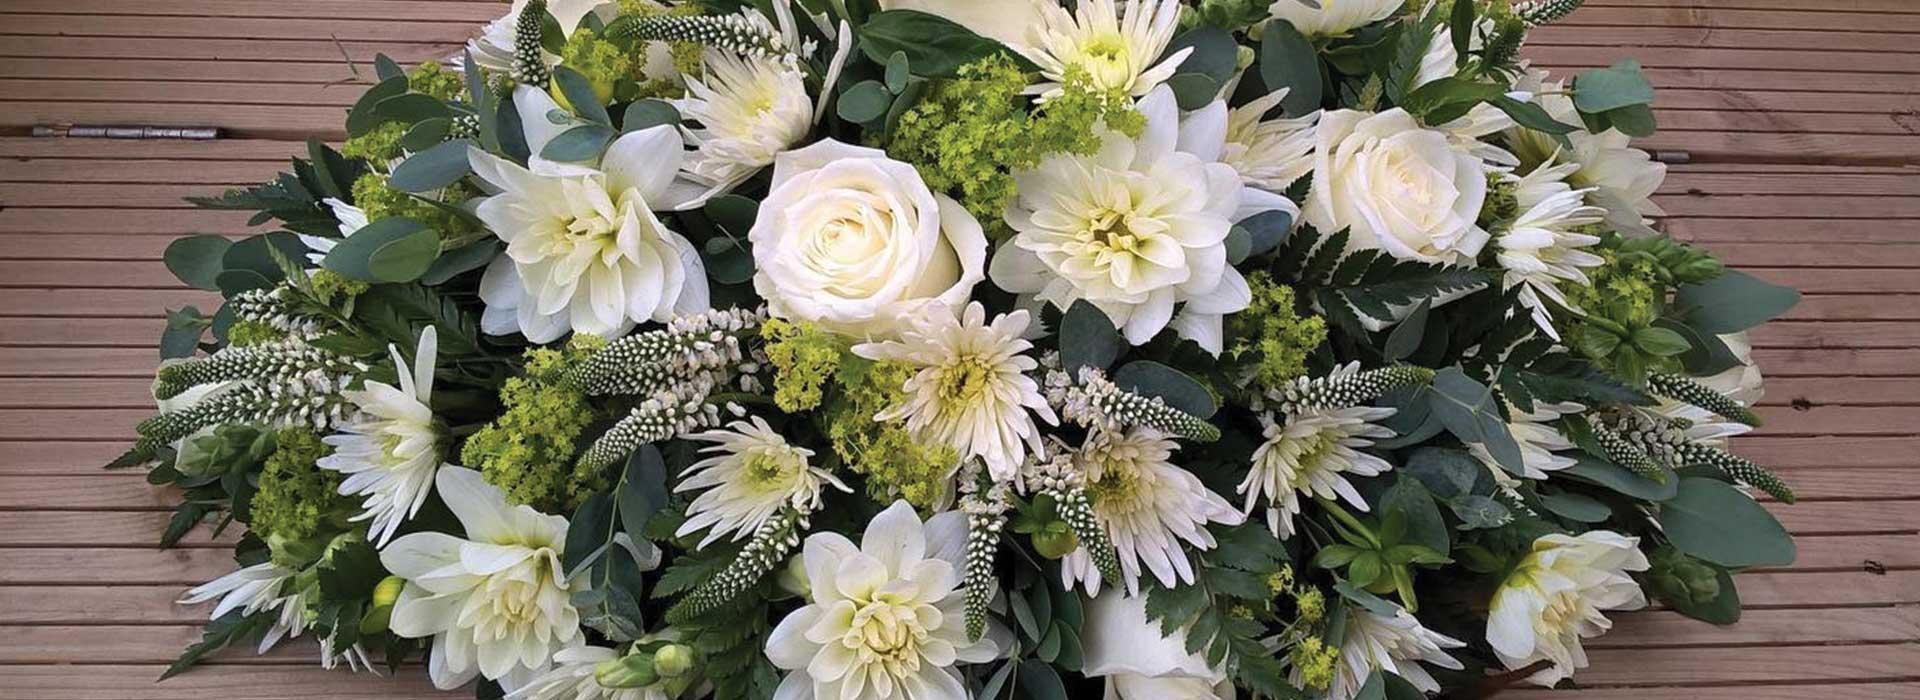 funeral flower arrangements casket sprays